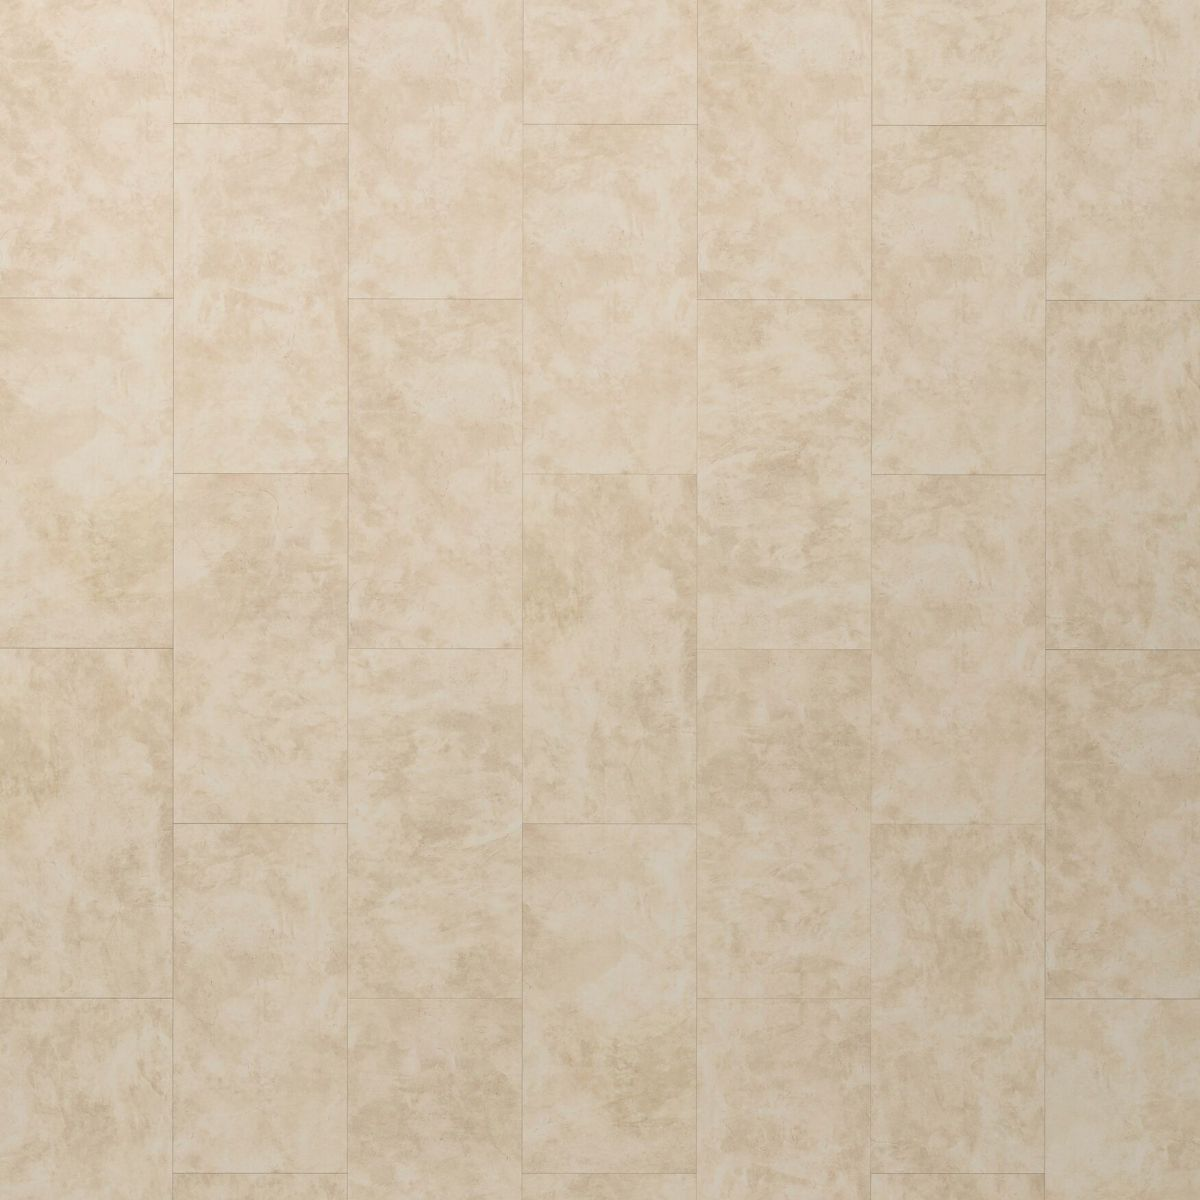 Avatara vloeren steen O5 plan